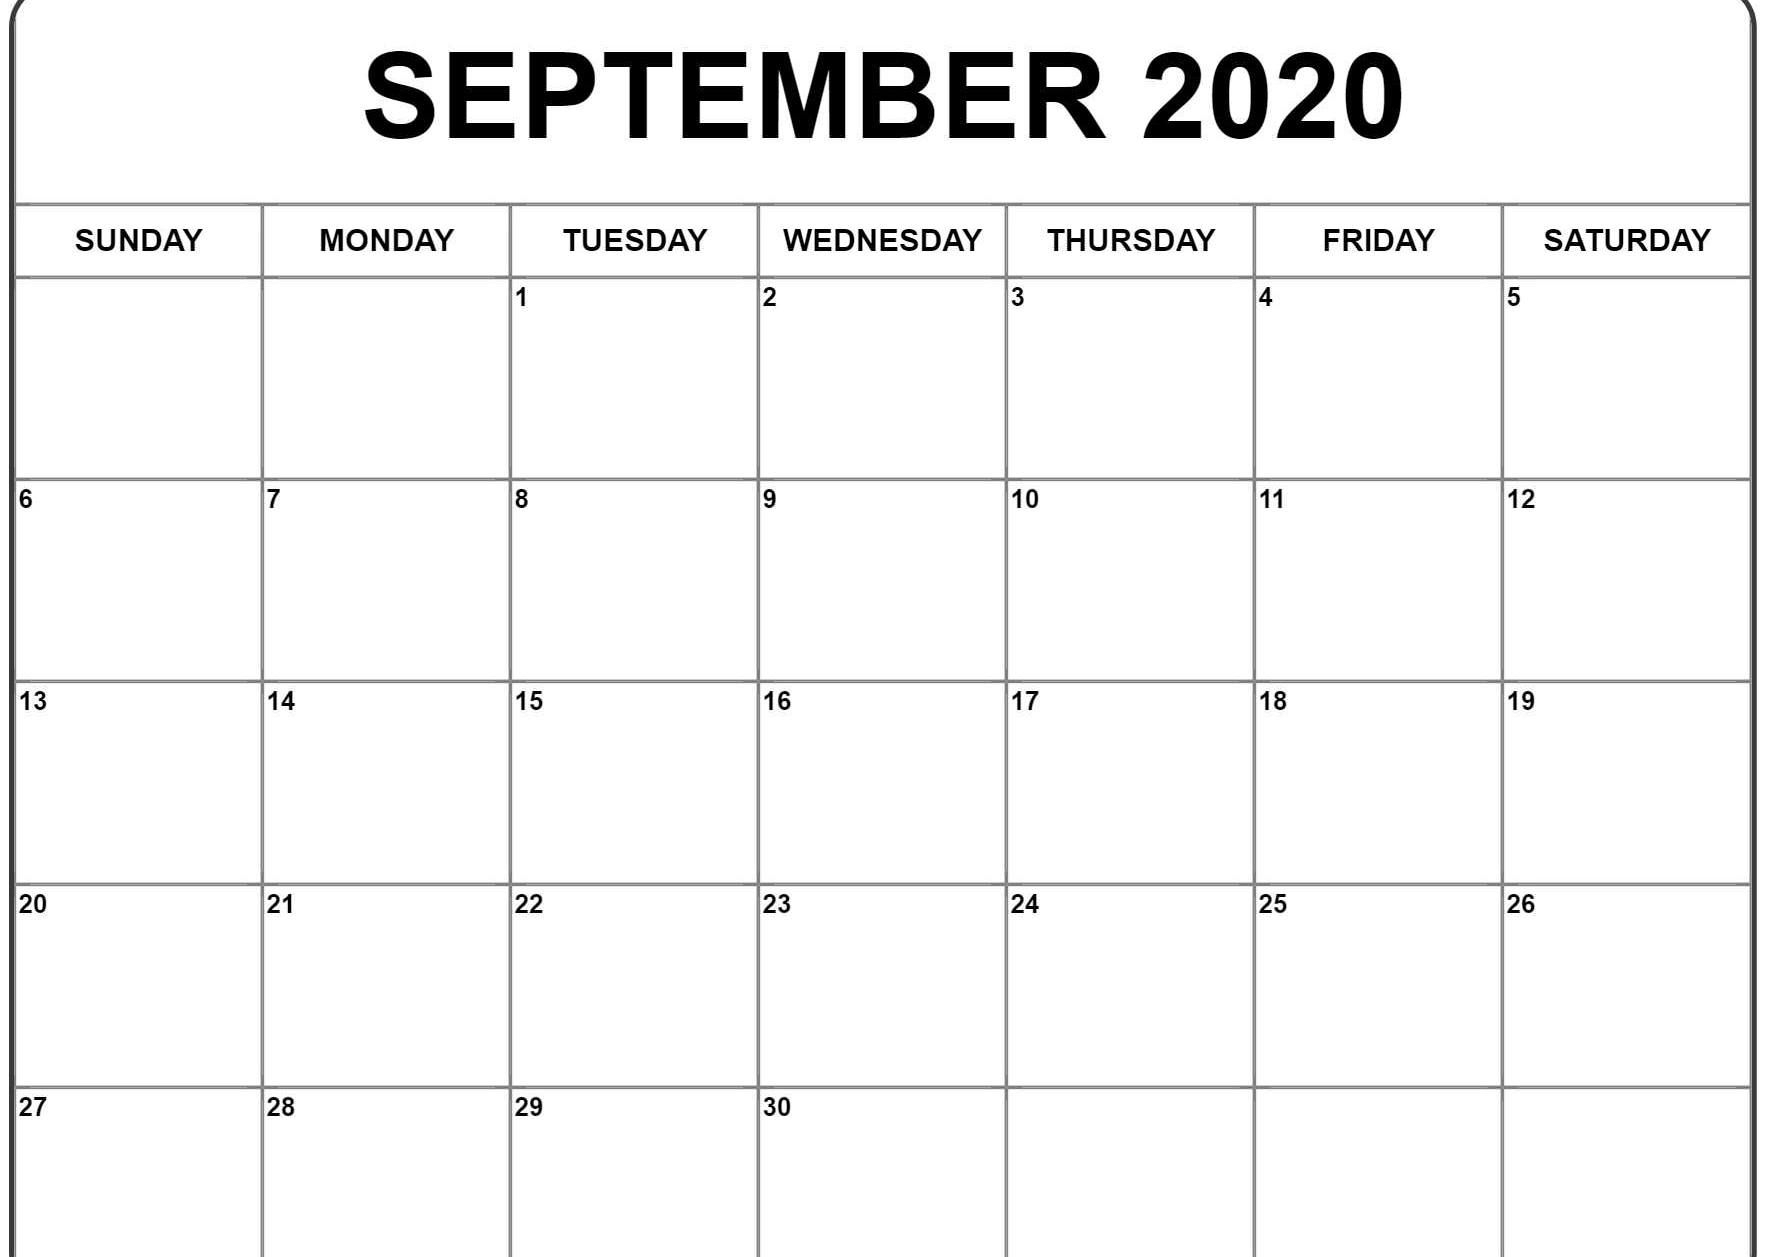 September 2020 Calendar | September Calendar, Monthly